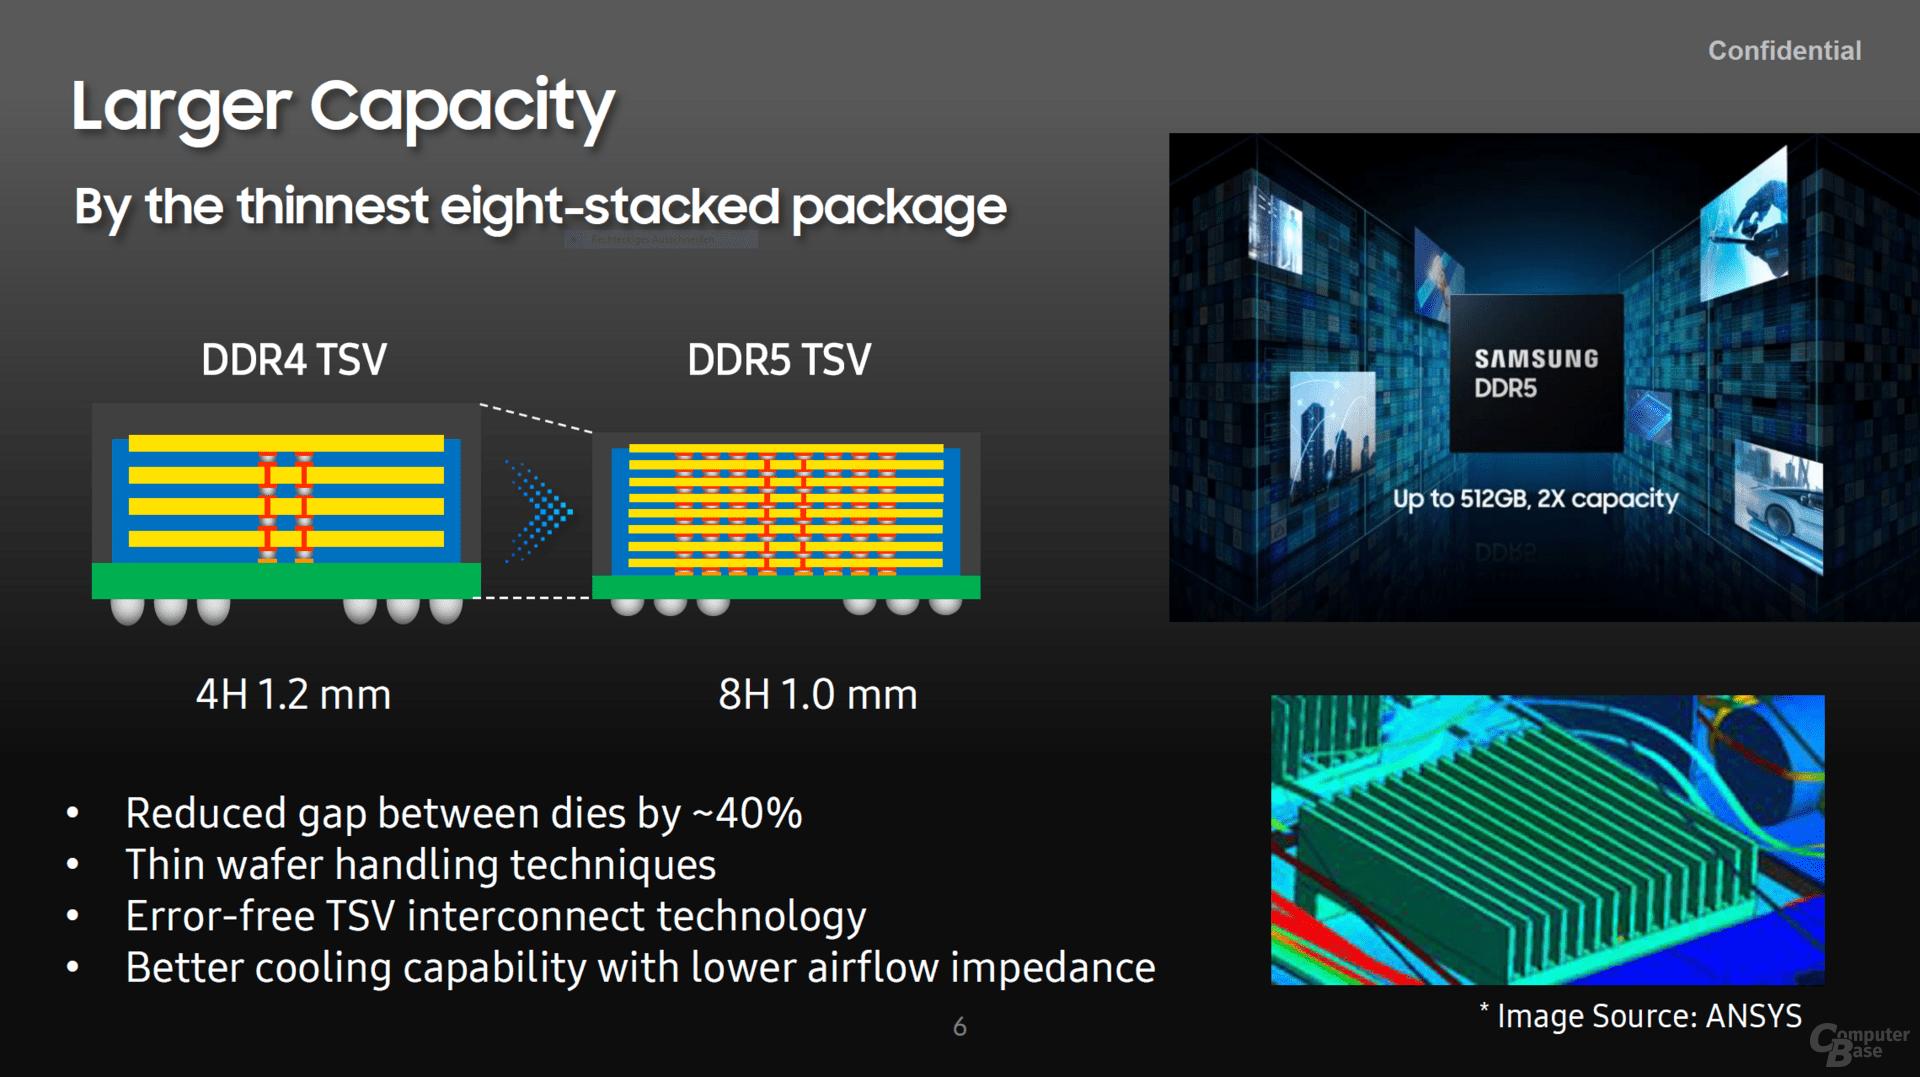 Chip Samsung DTR5 con ocho matrices apiladas